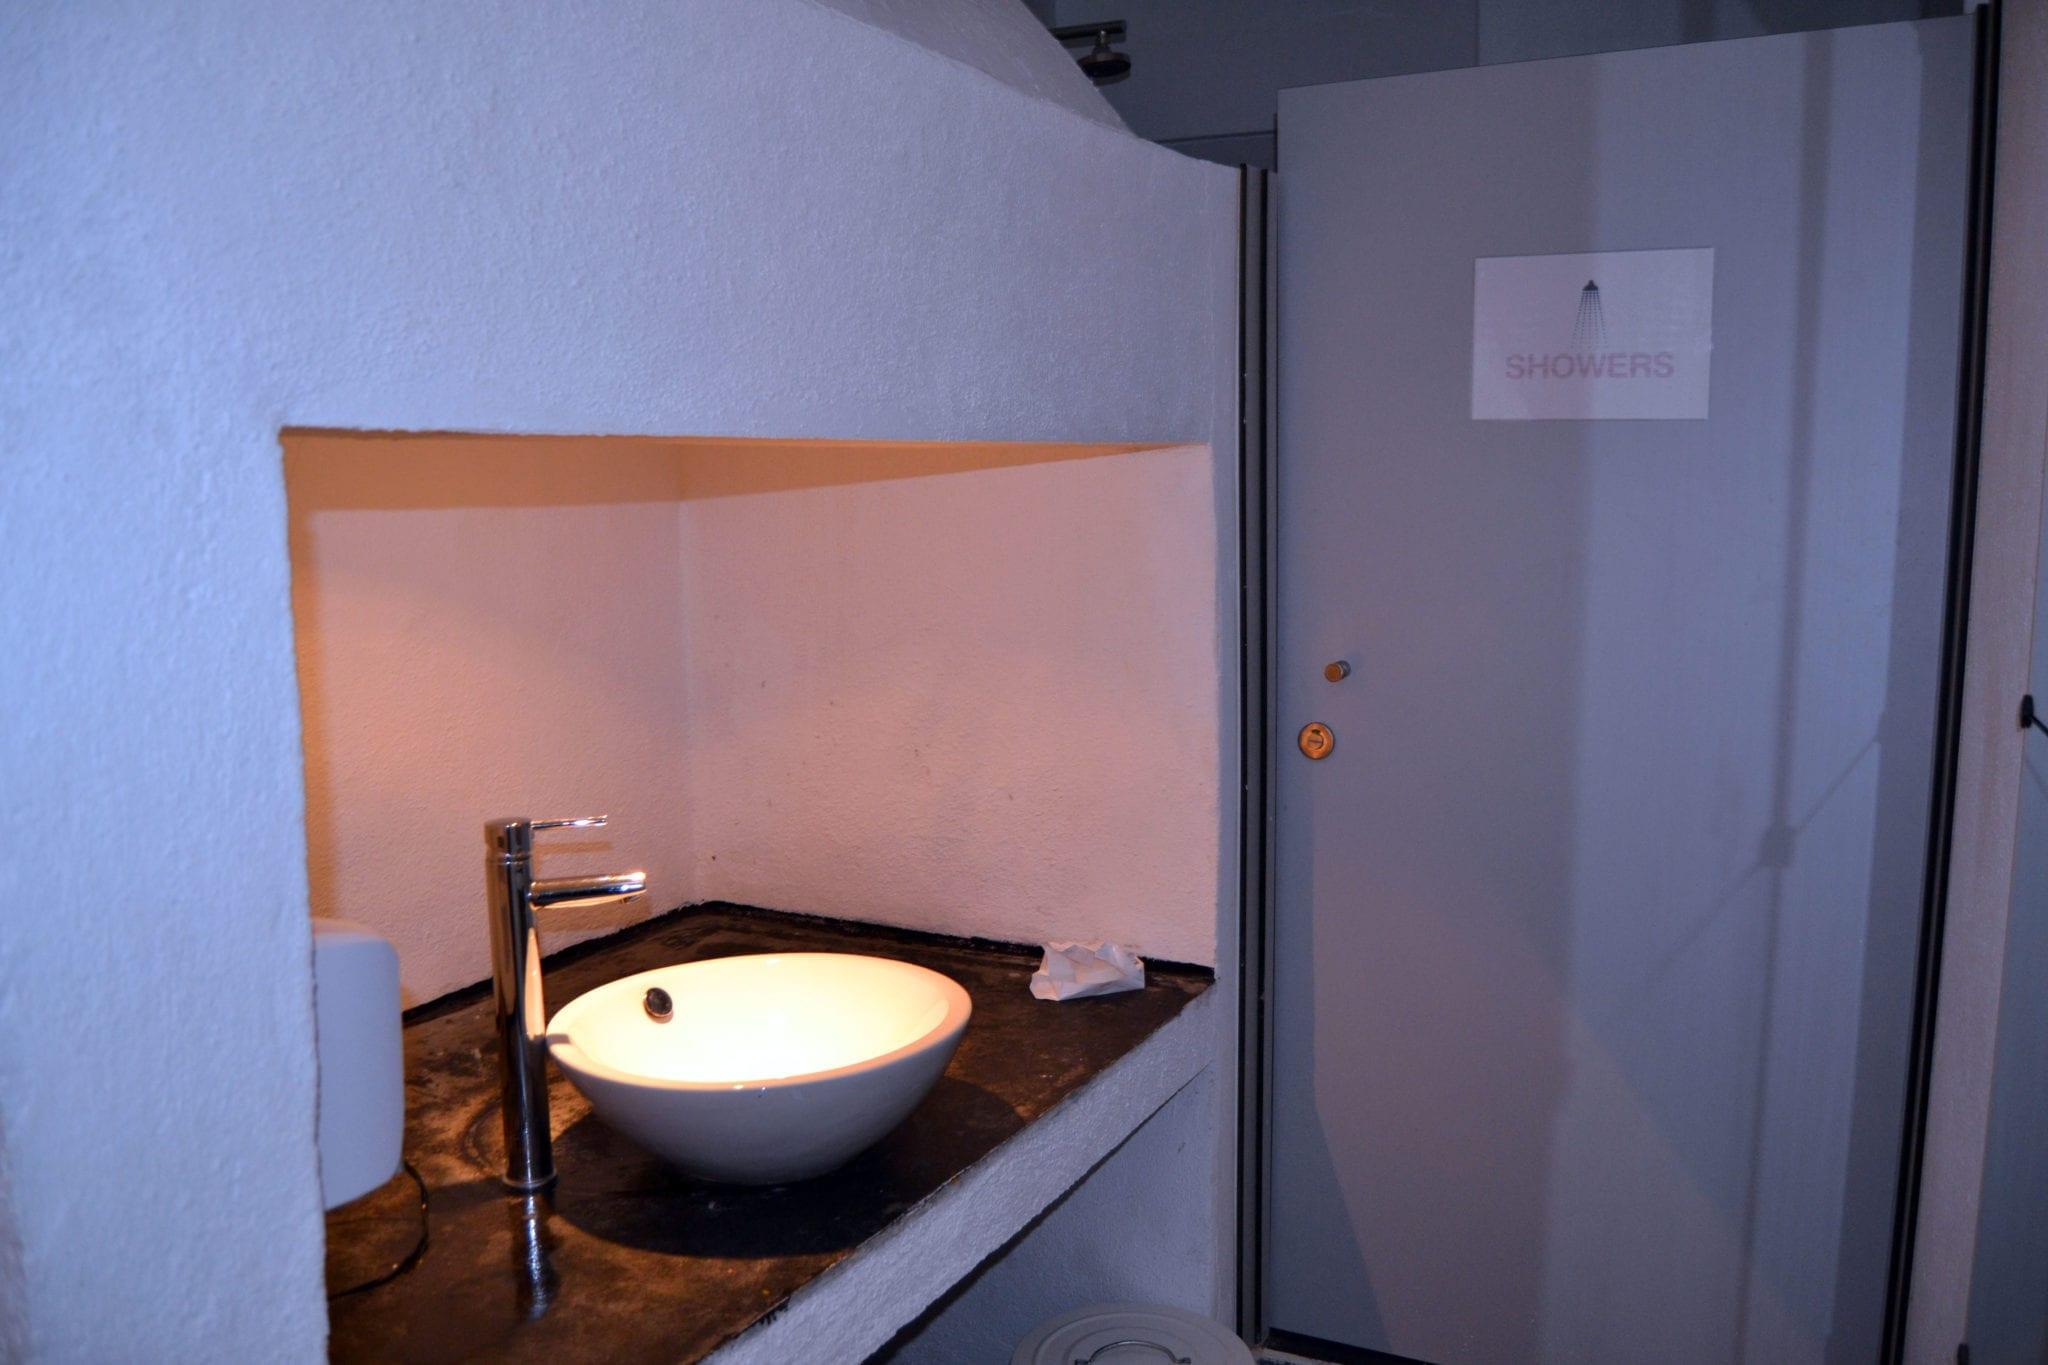 banheiro equity point lisboa